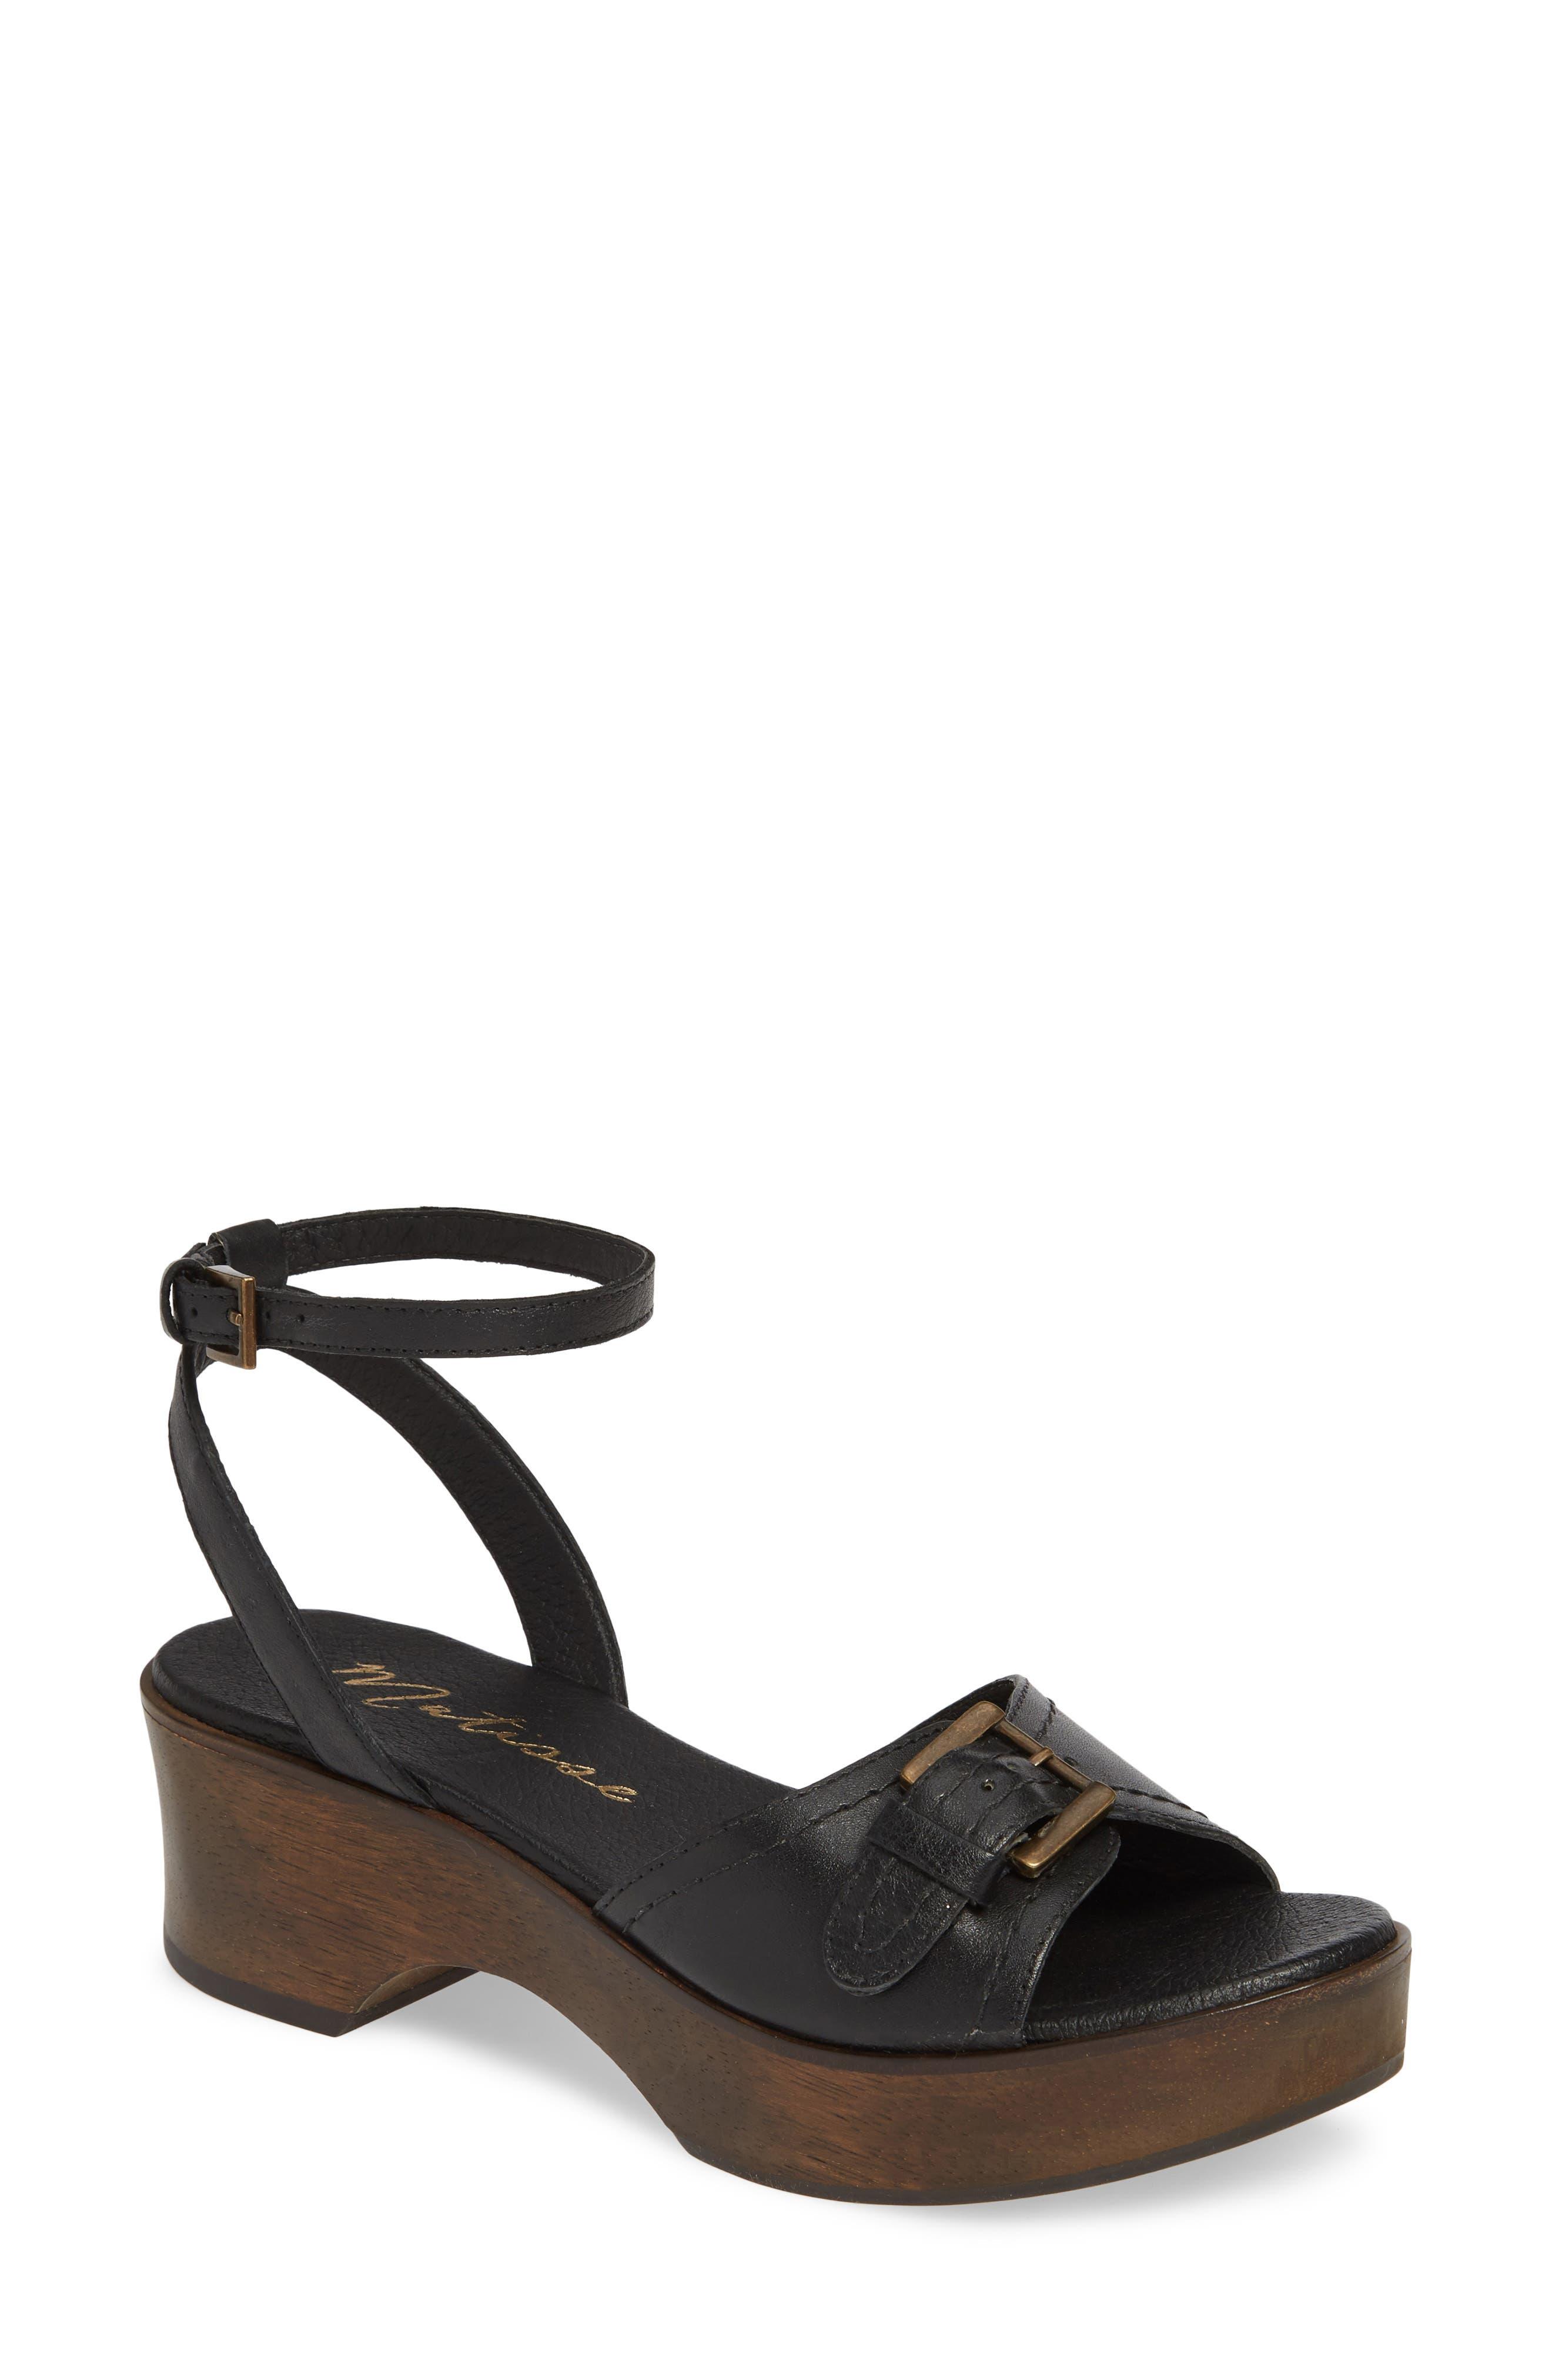 Matisse Dutch Sandal, Black